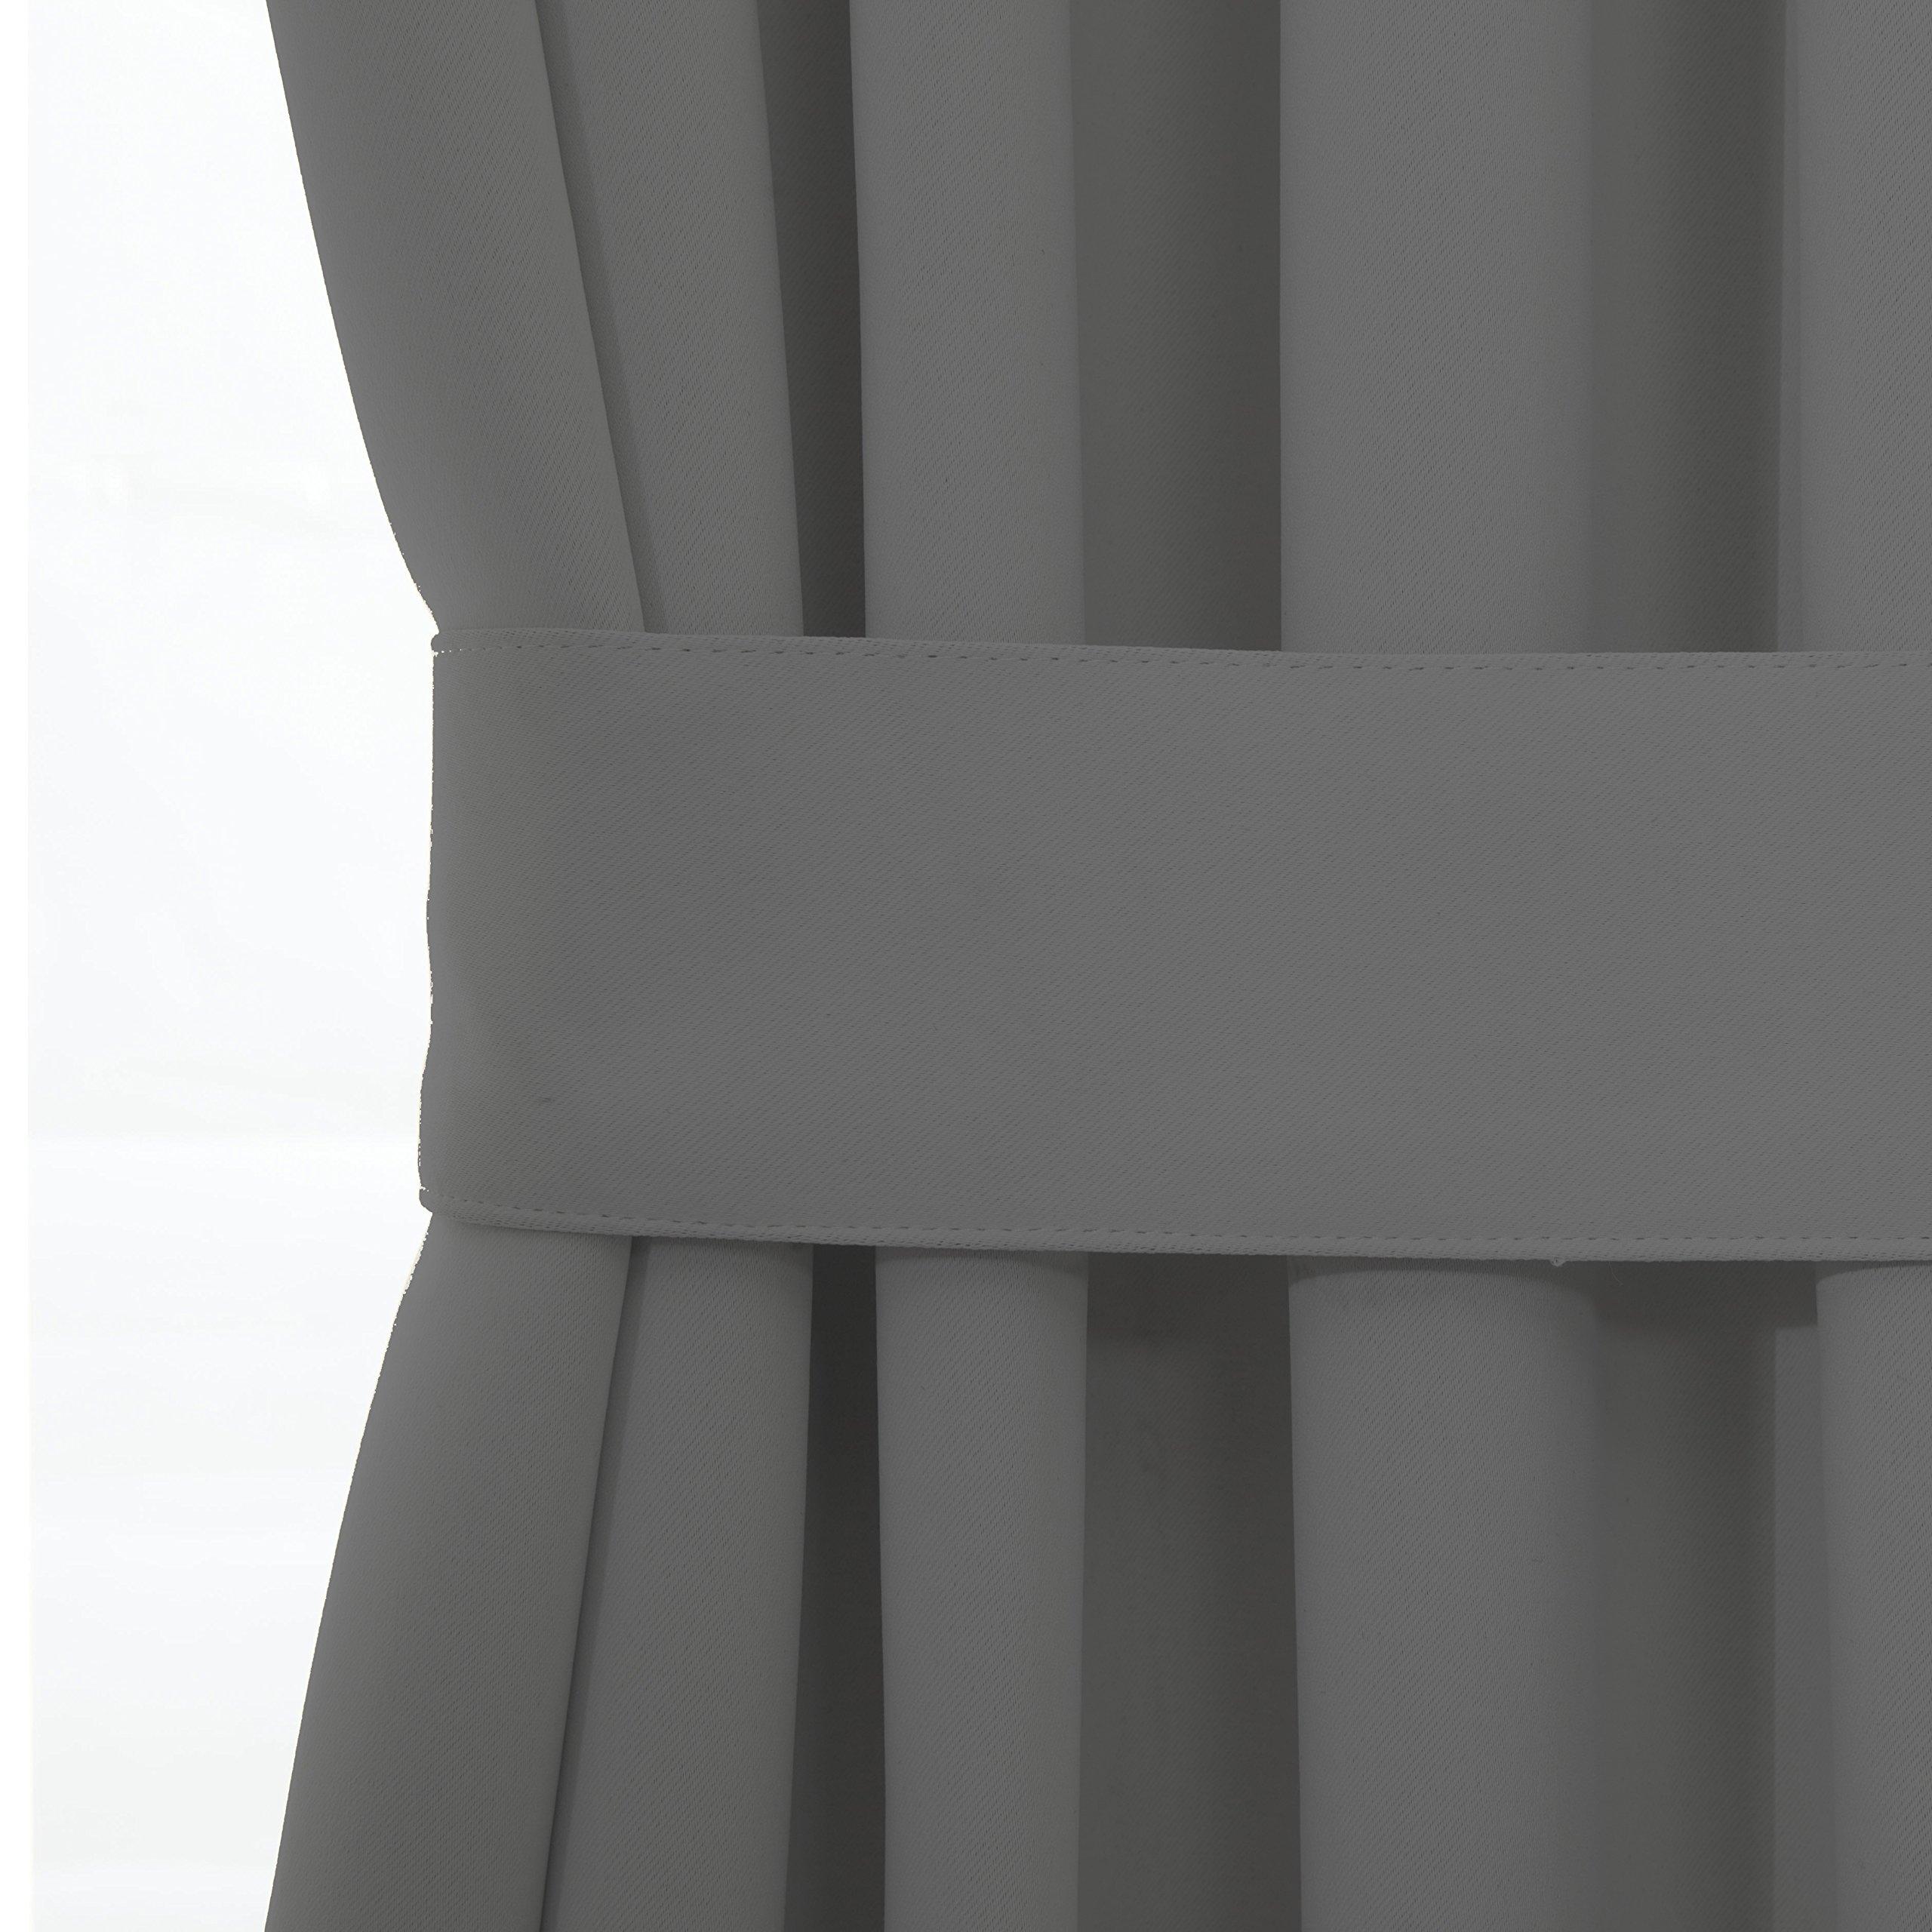 Blackout Door/ Window Curtain Panels for Privacy - Aquazolax 54W x 40L Blackout Window Treatment Curtains for French Door - 1 Panel, Grey by Aquazolax (Image #5)